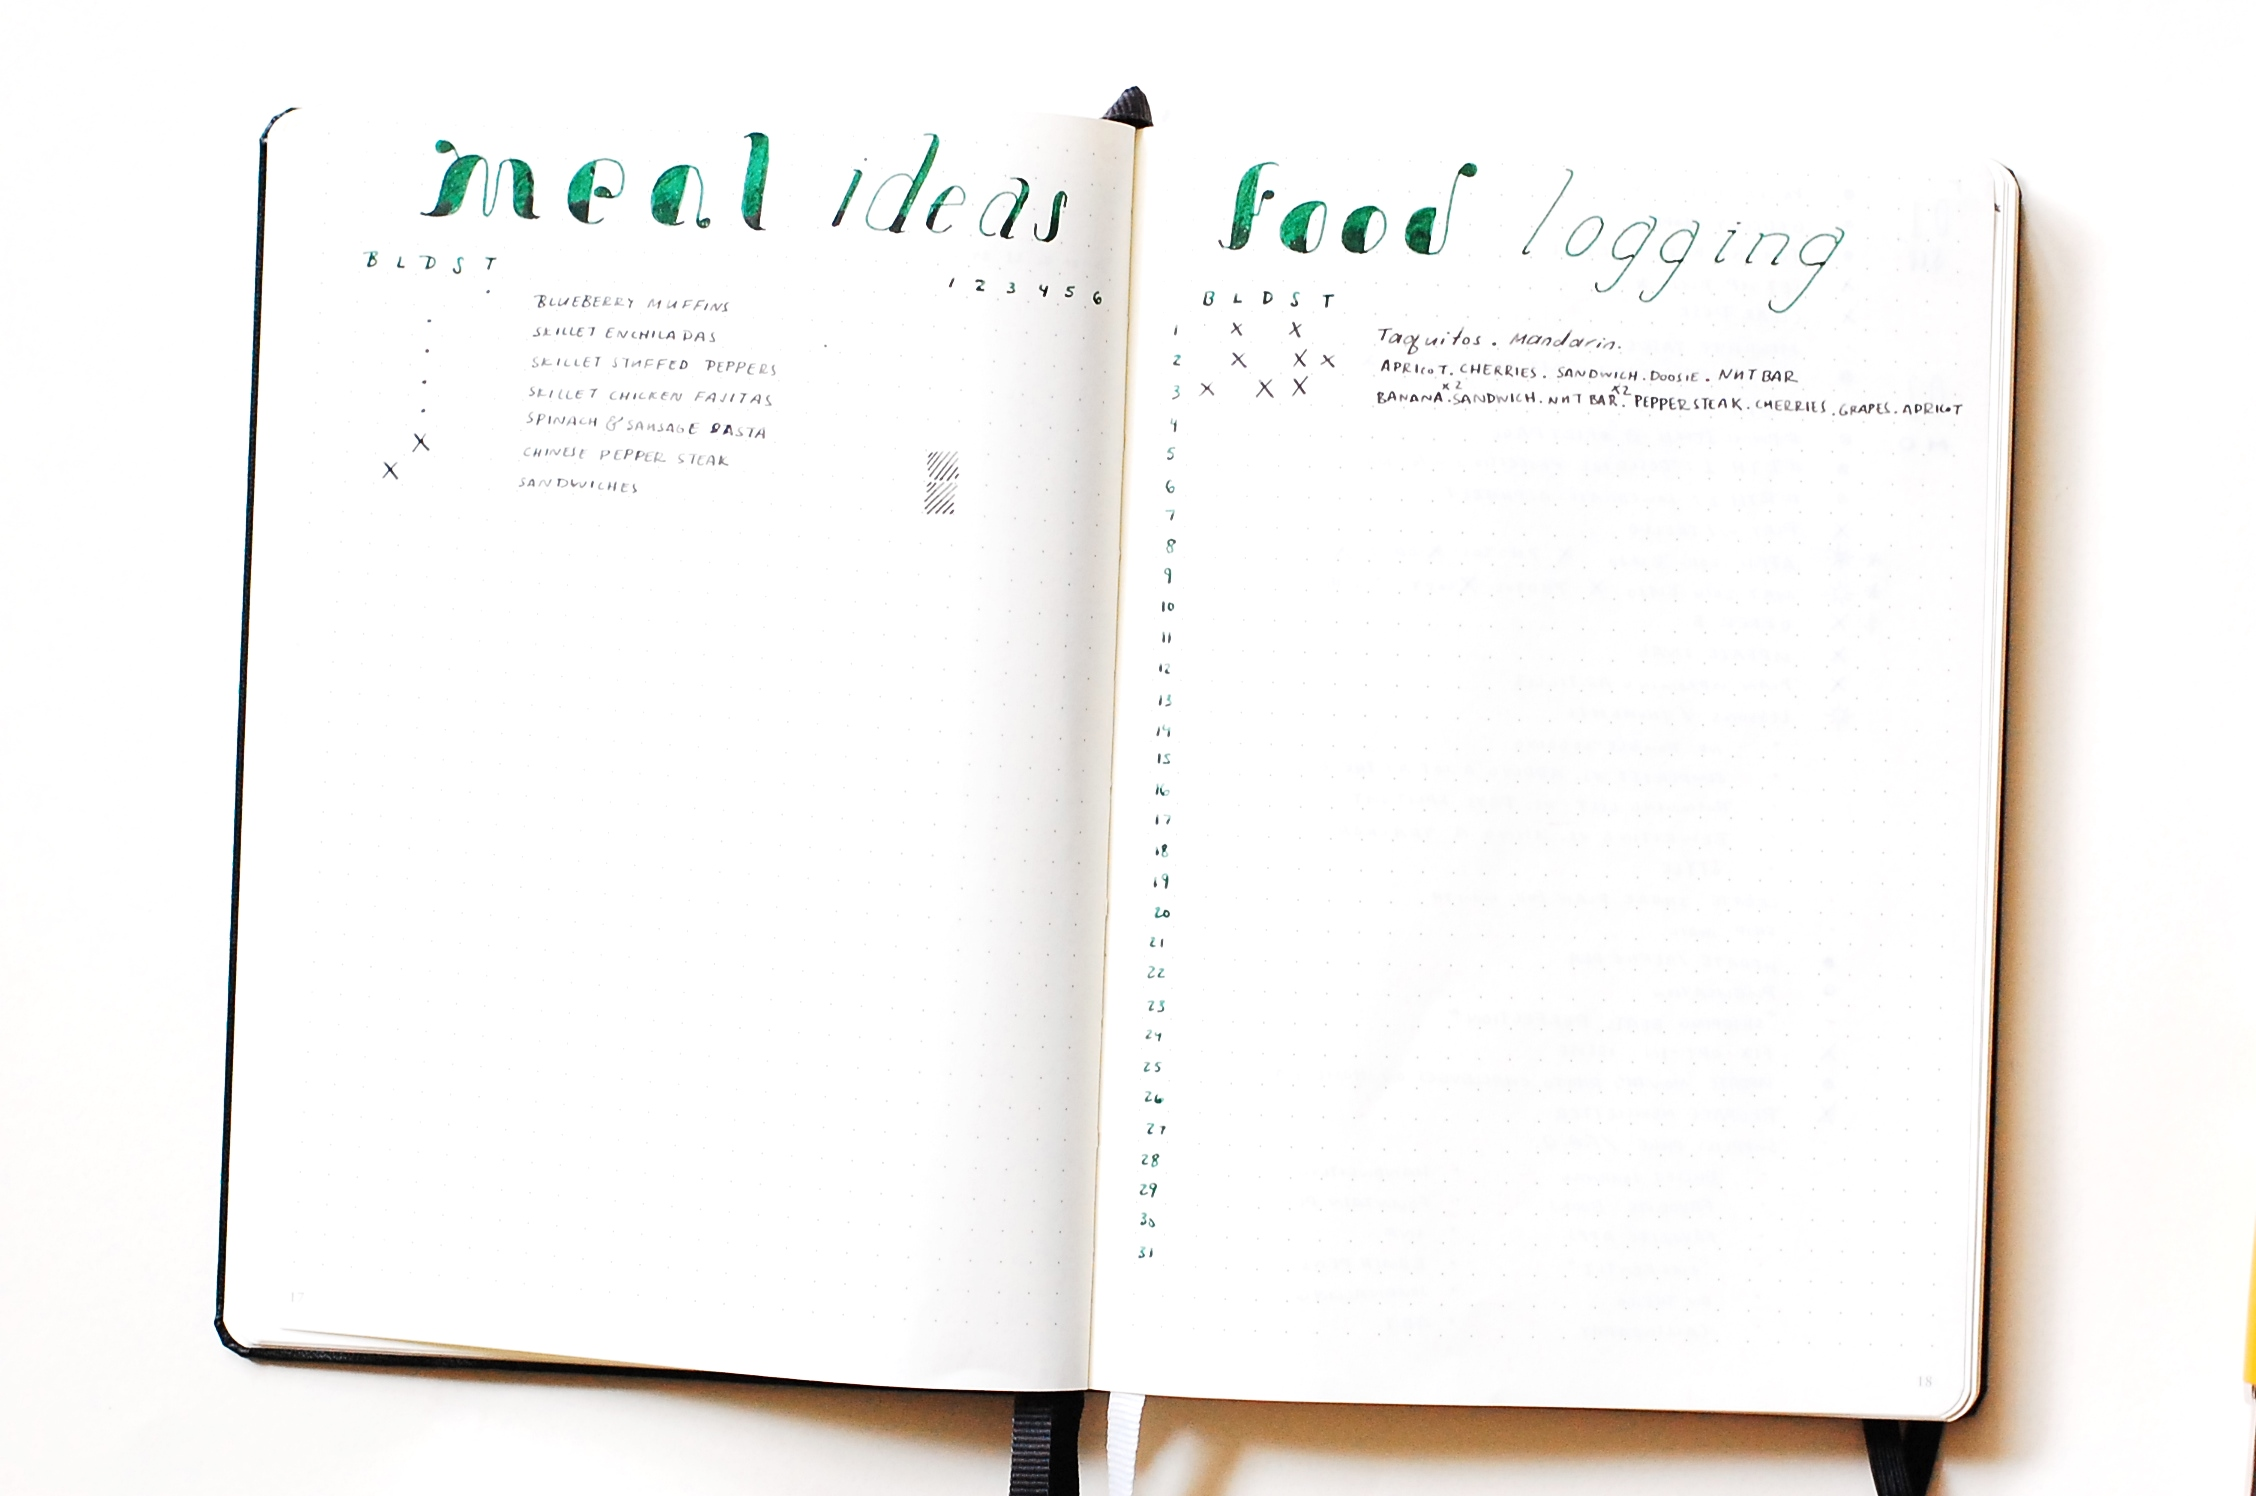 Meal ideas & Food logging - Bullet Journal